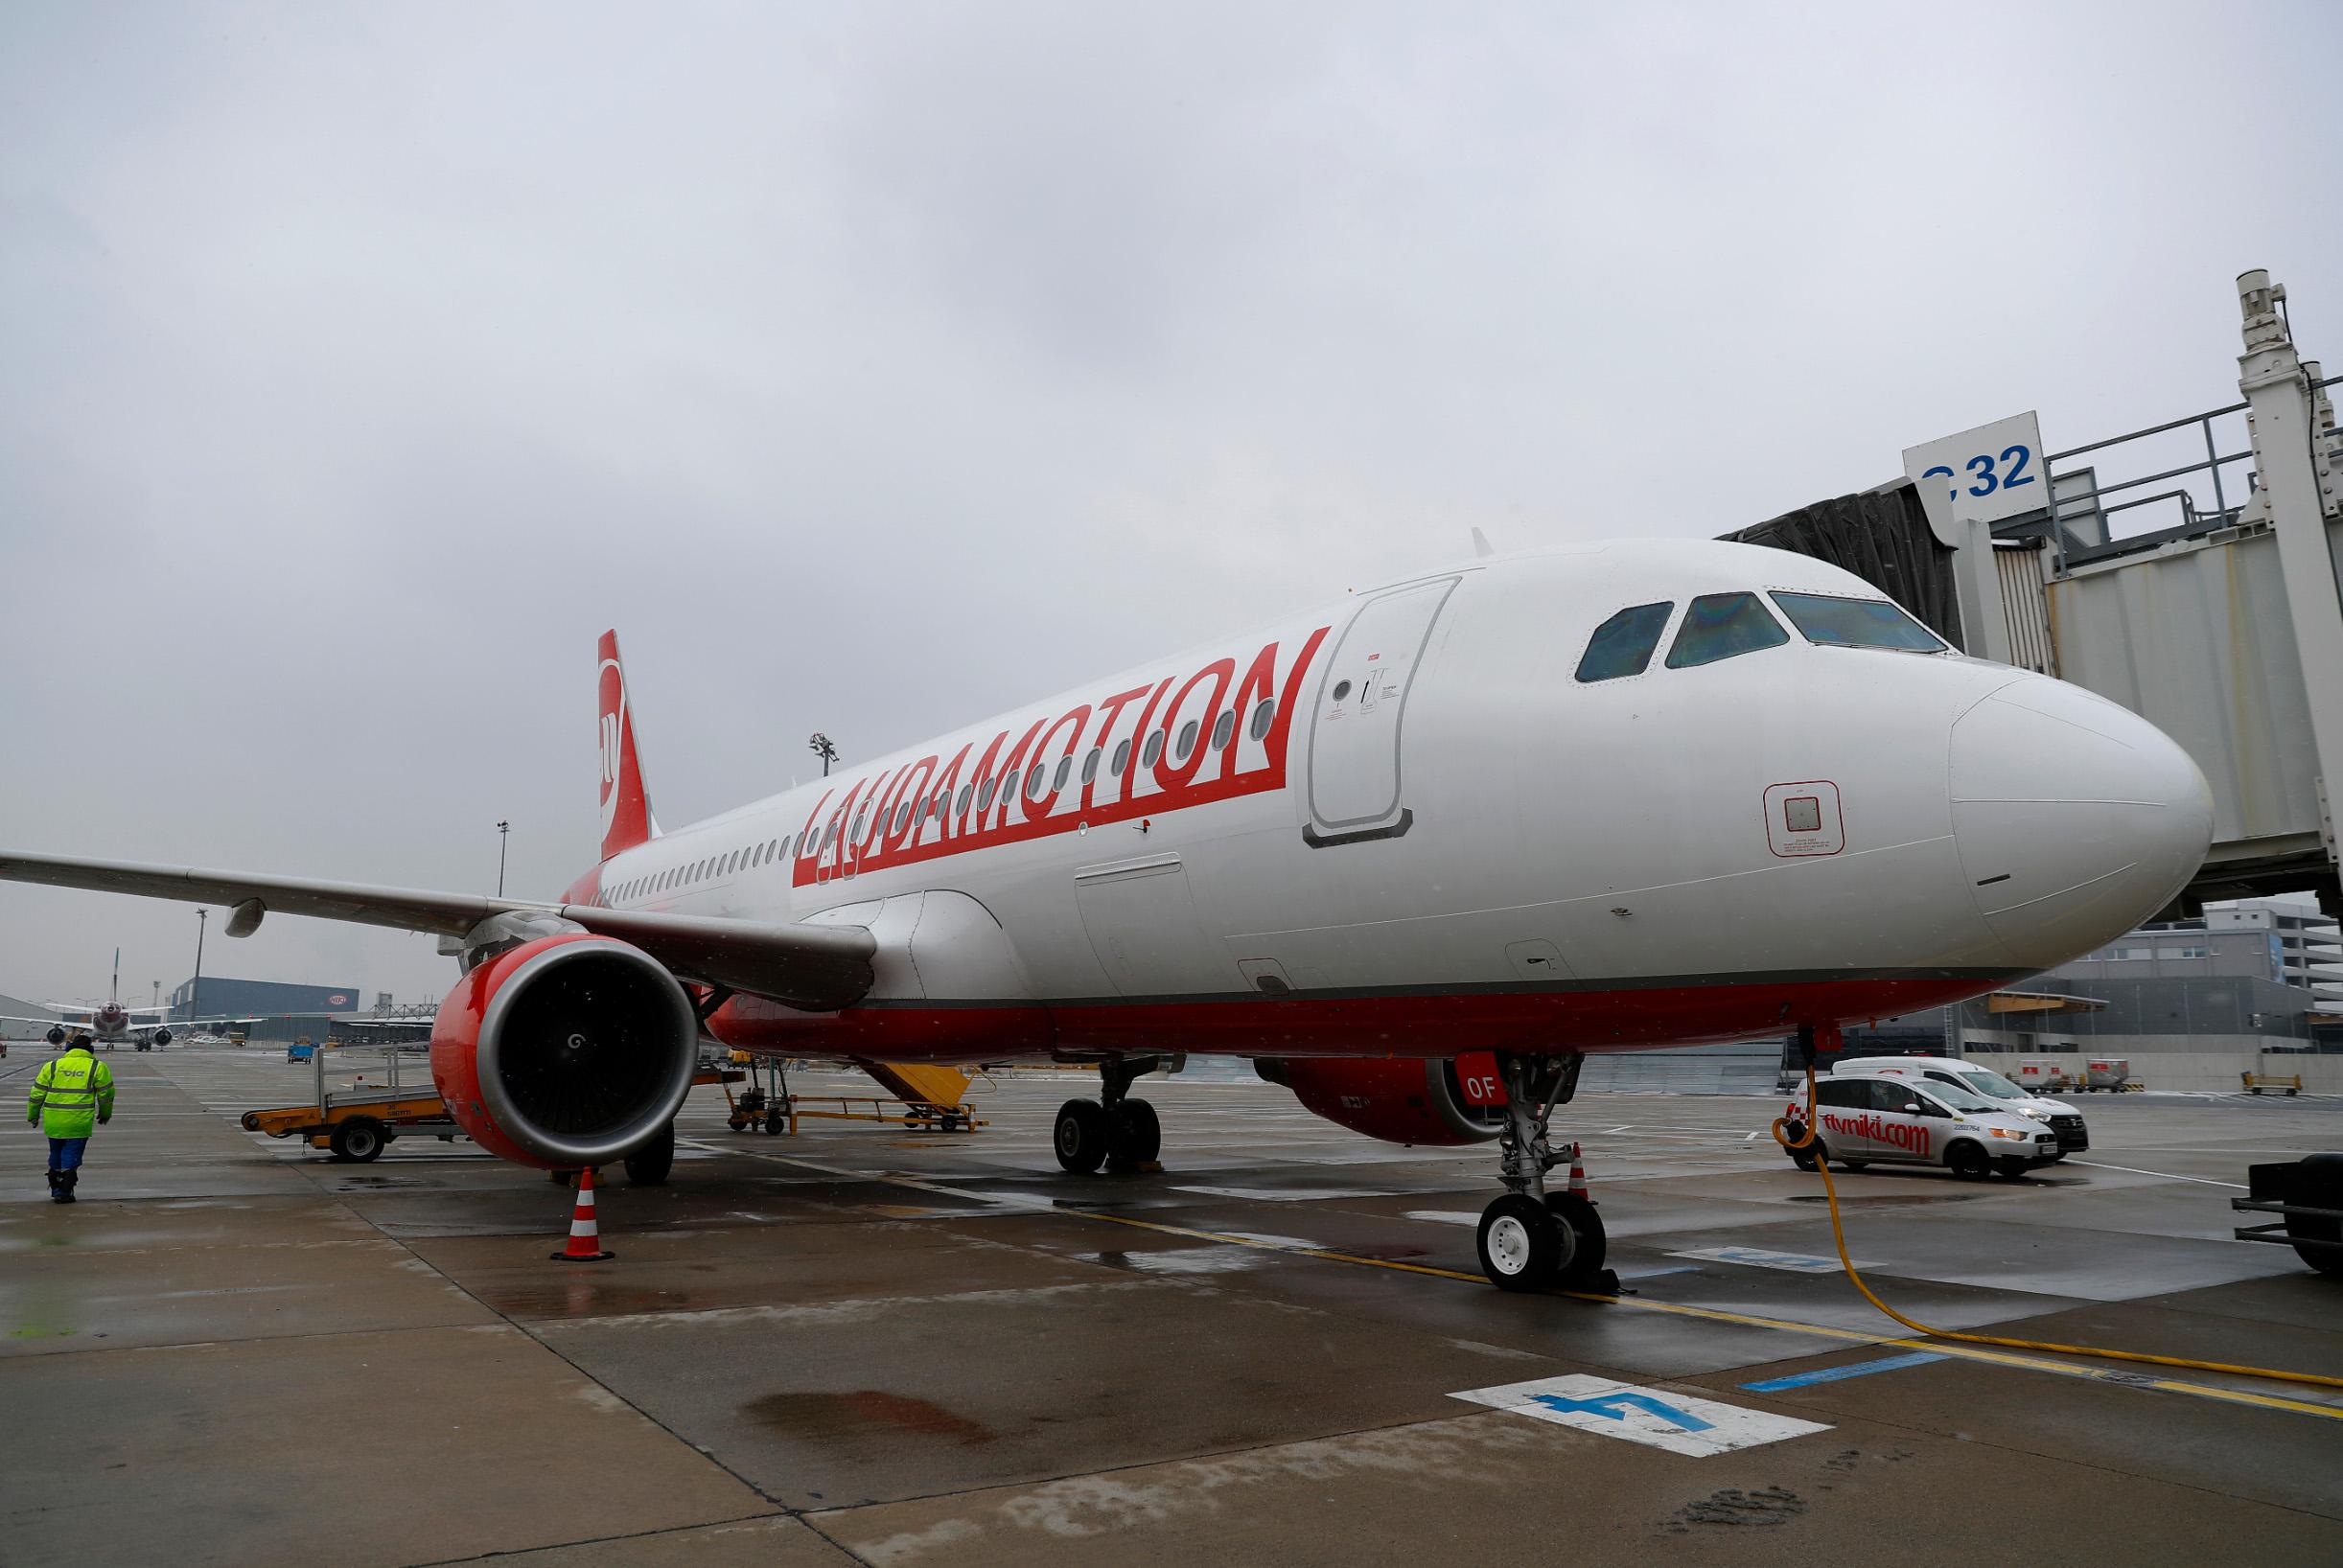 Airbus A320 Laudamotiona